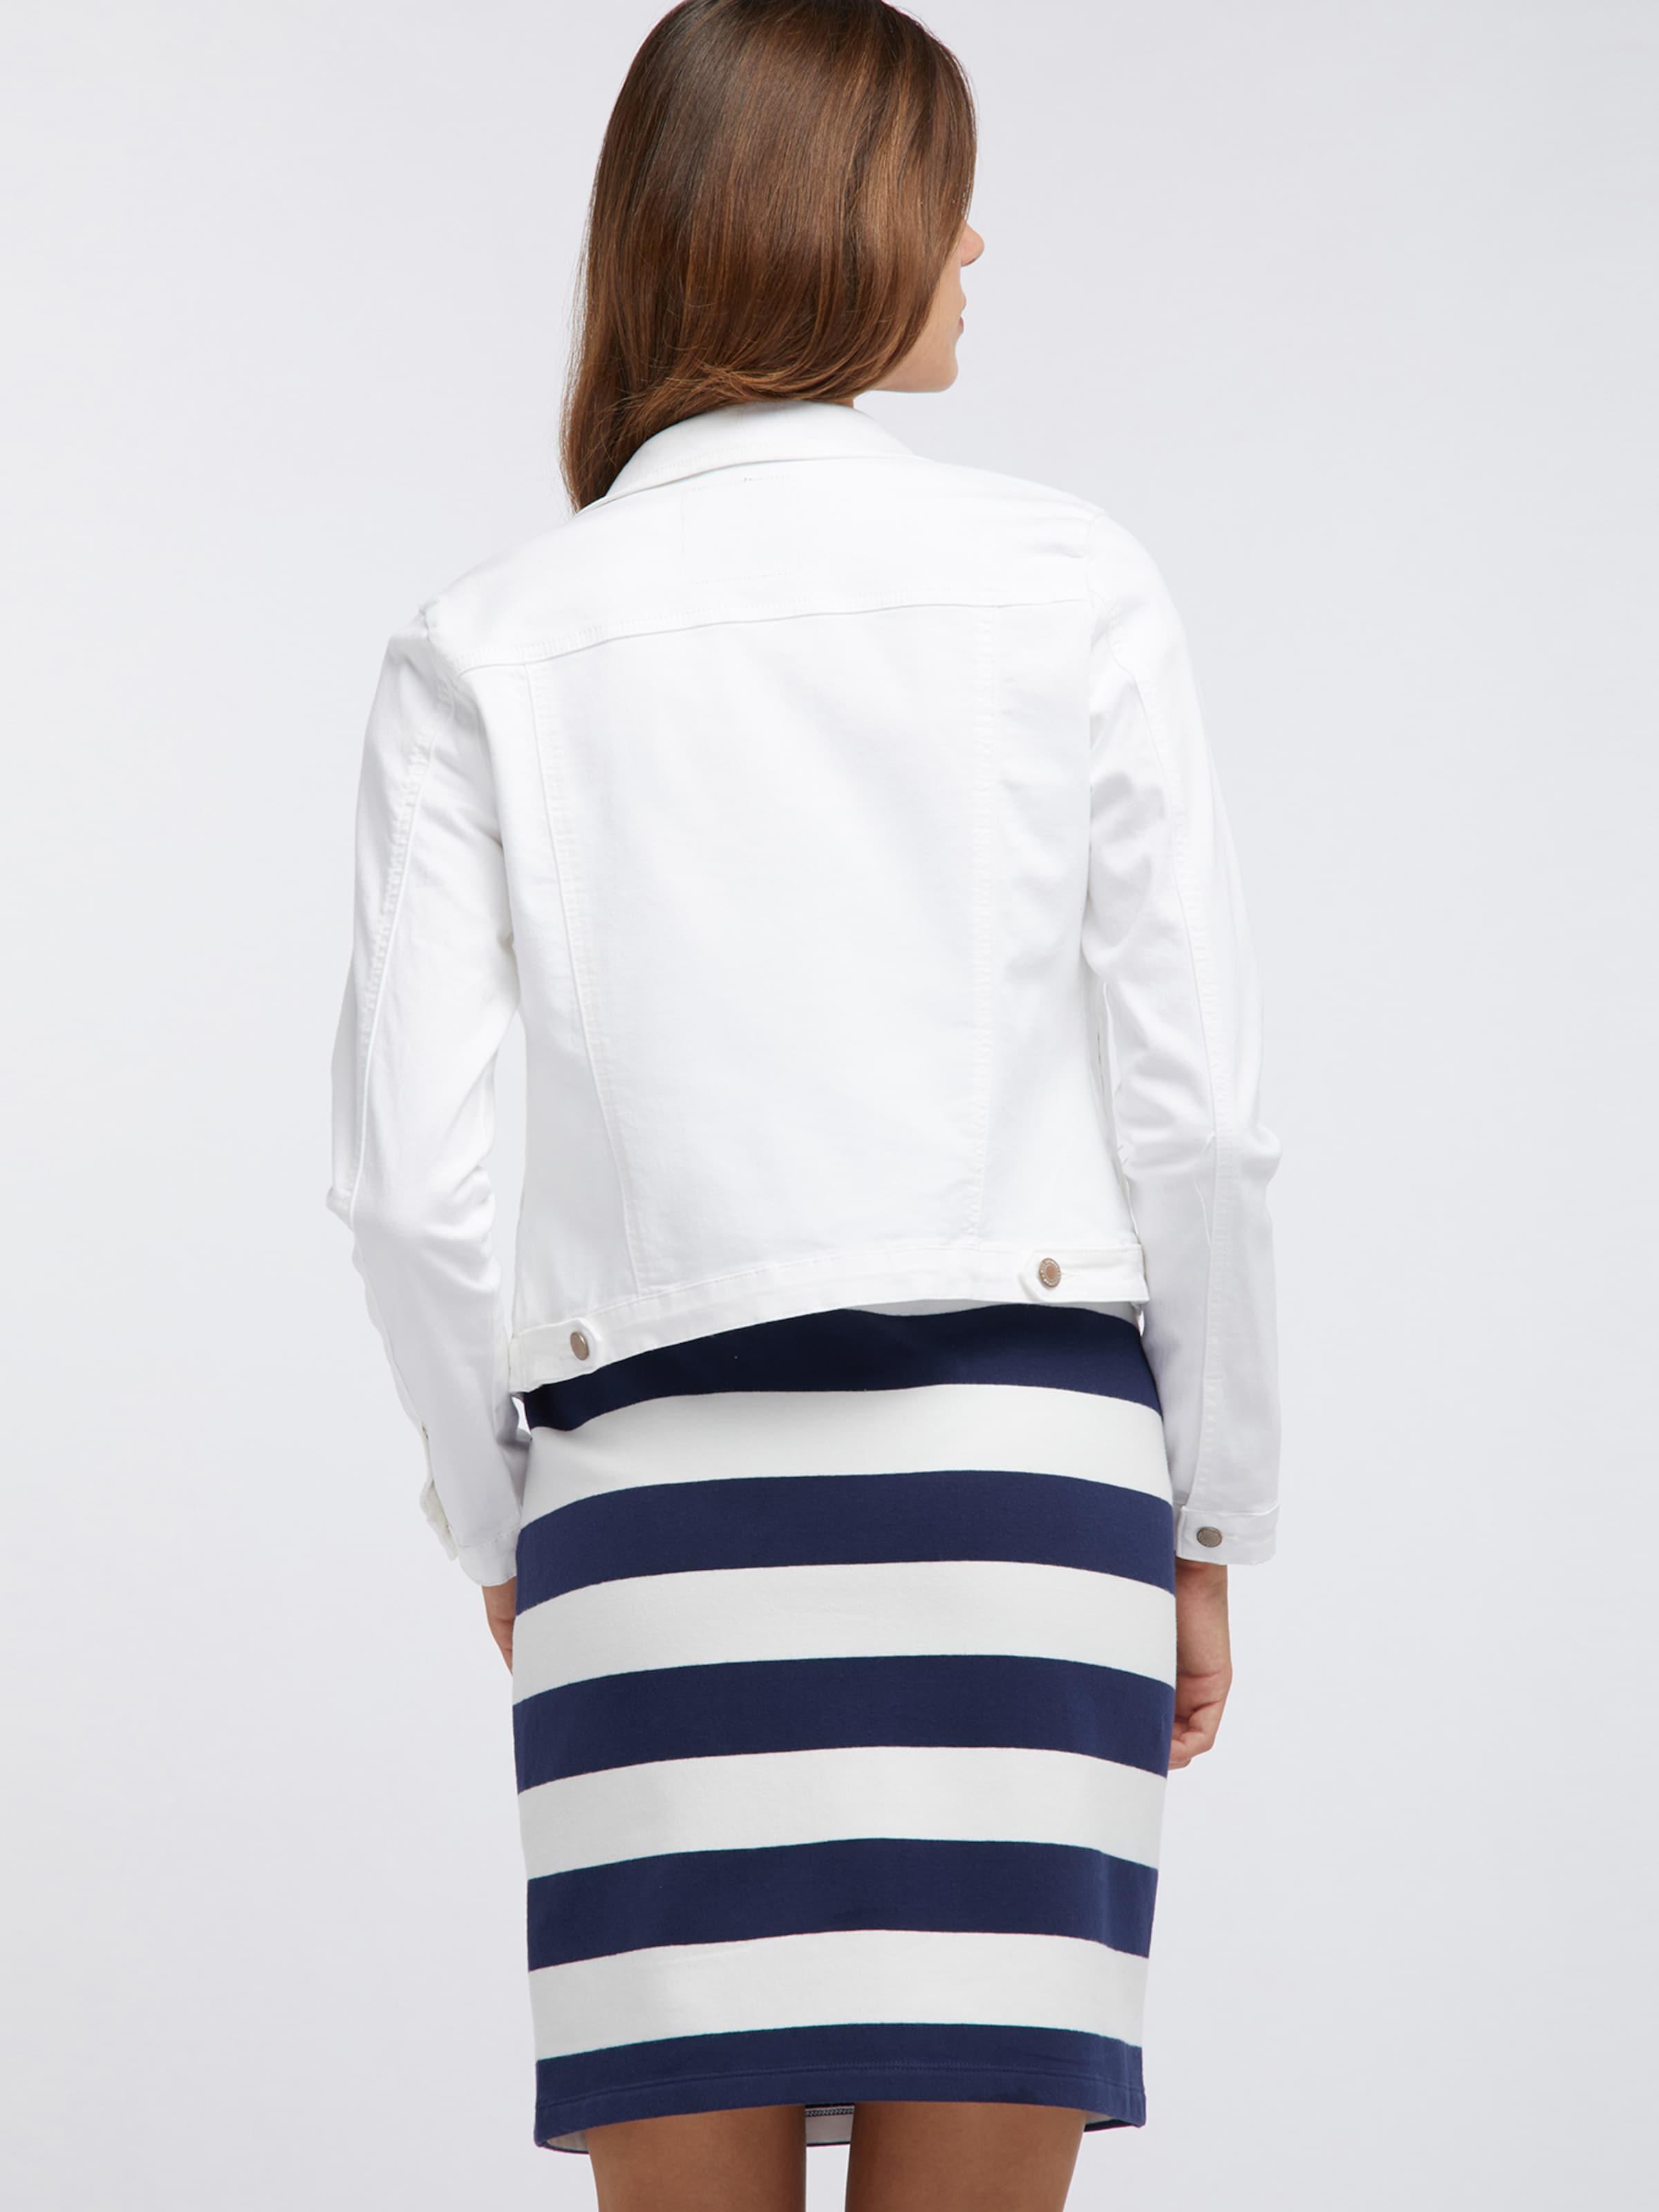 Blanc En Fashion 'jacket Veste Mi Odell' Broadway Nyc saison XZOuPki